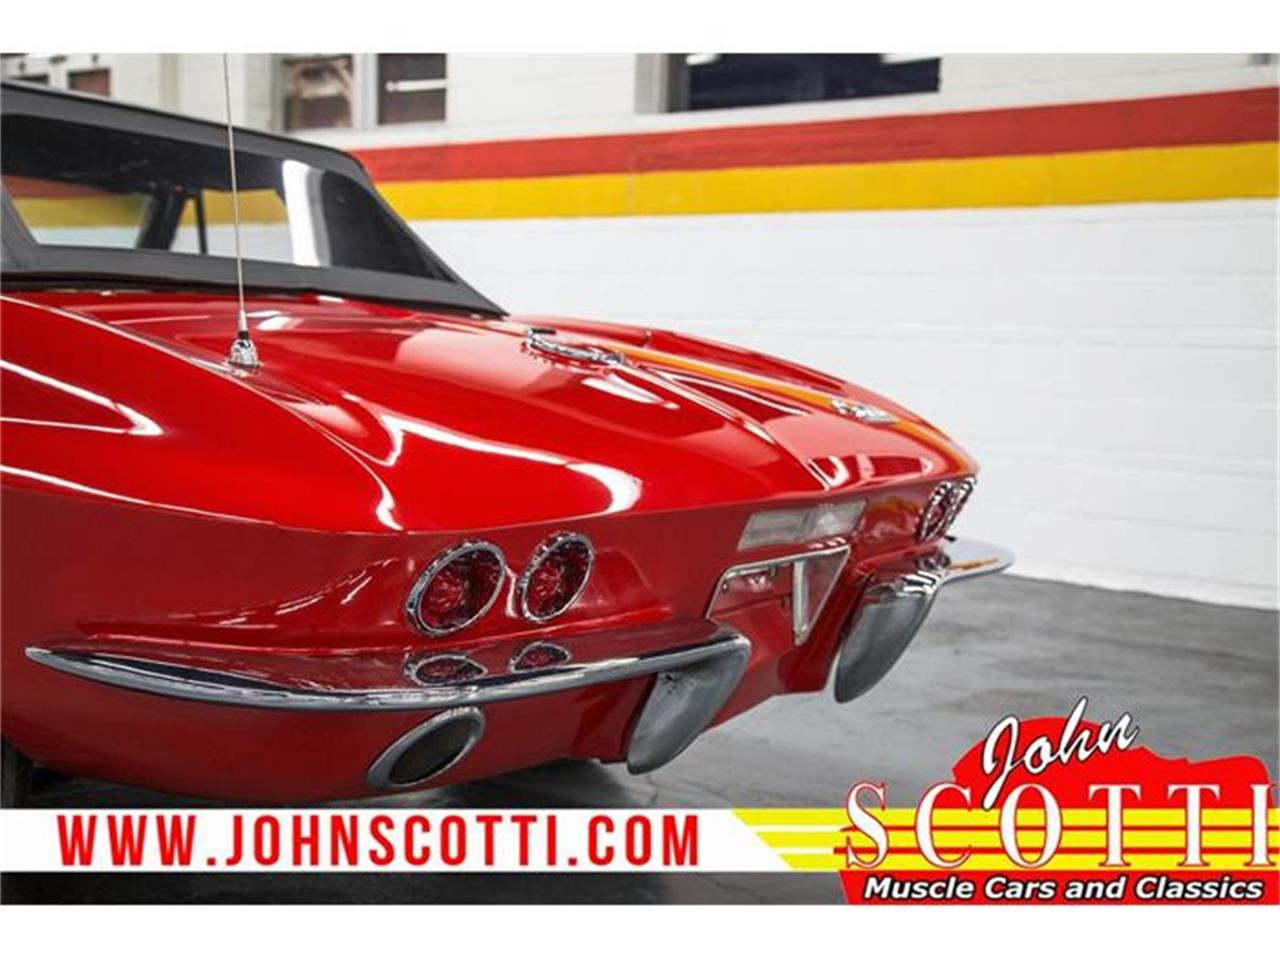 Large Picture of Classic '67 Corvette located in Montreal Quebec - $59,990.00 - GA0F